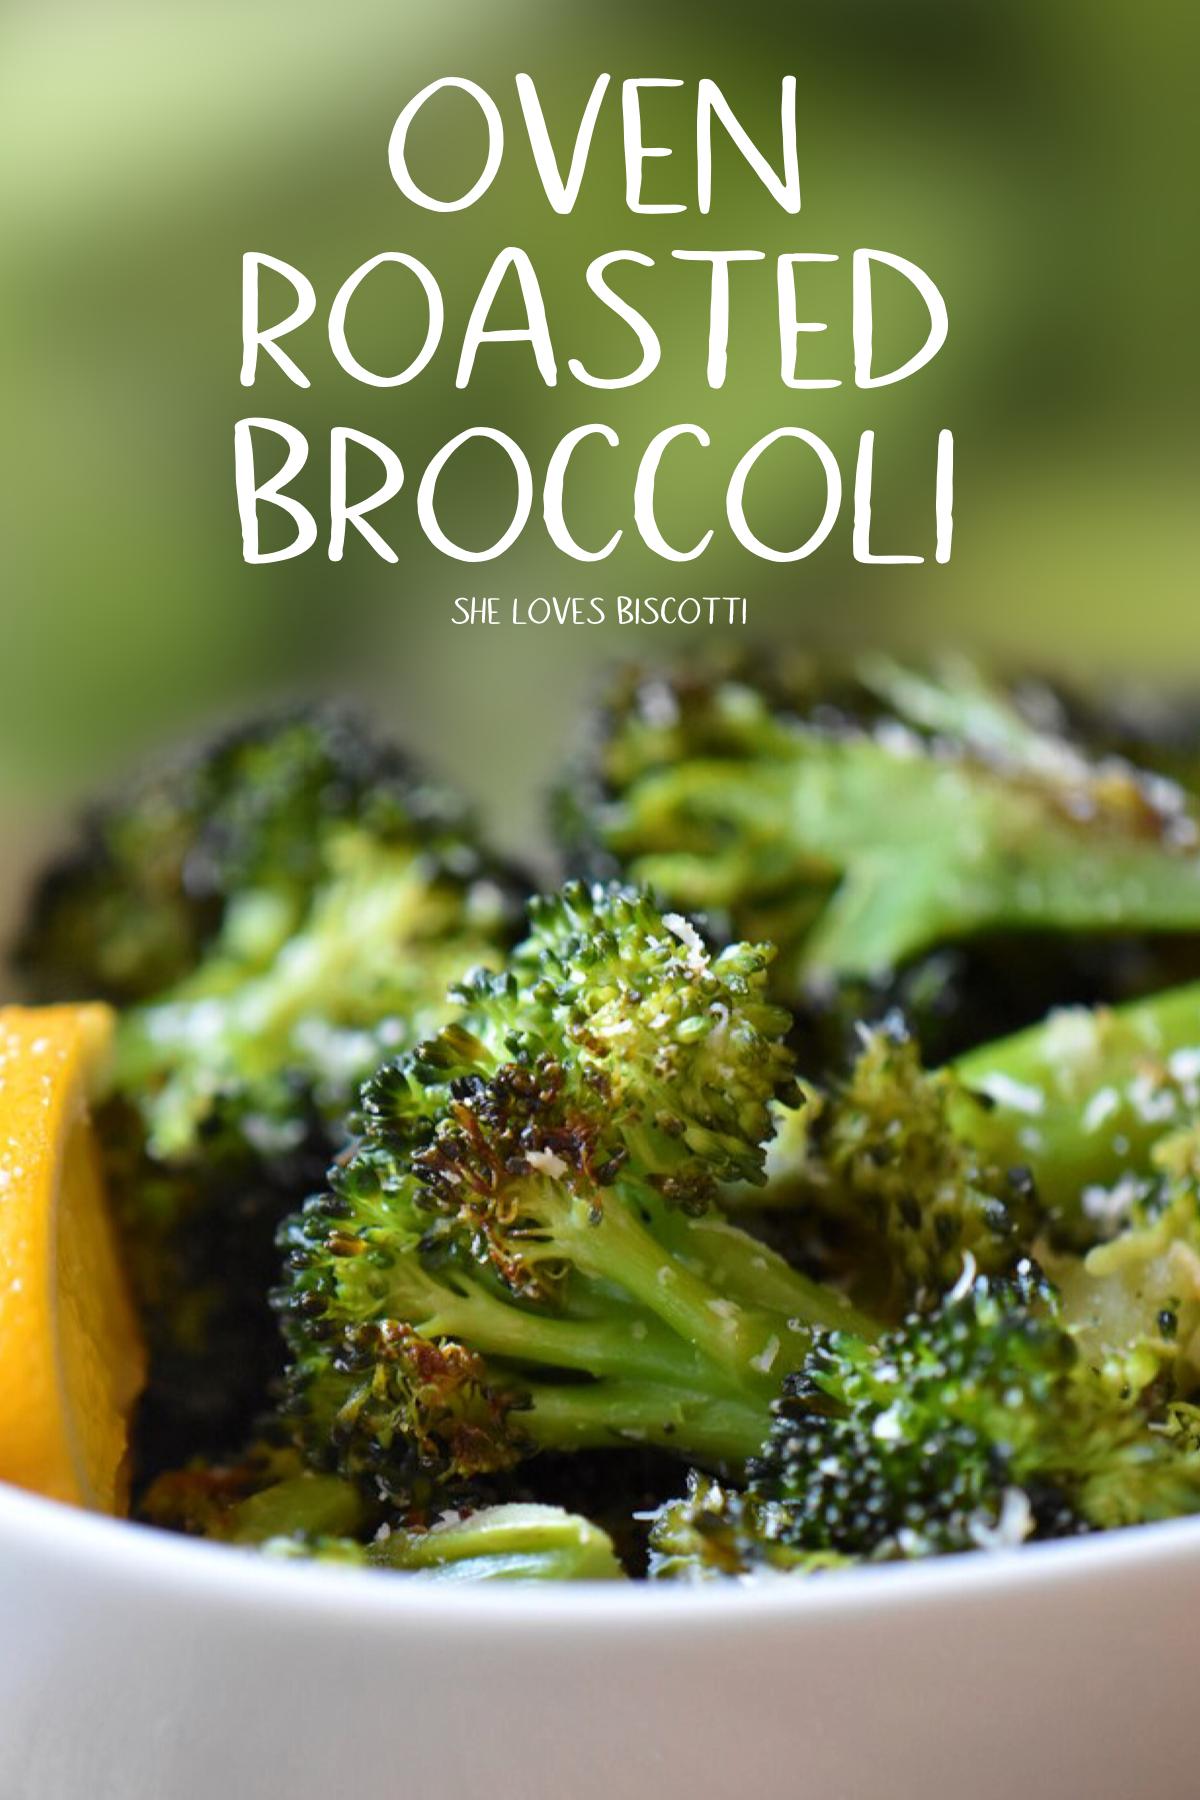 Oven Roasted Broccoli Recipe Simple Oven Roasted Broccoli Oven Roasted Broccoli Parmes Roasting Broccoli In Oven Roasted Broccoli Recipe Broccoli Recipes